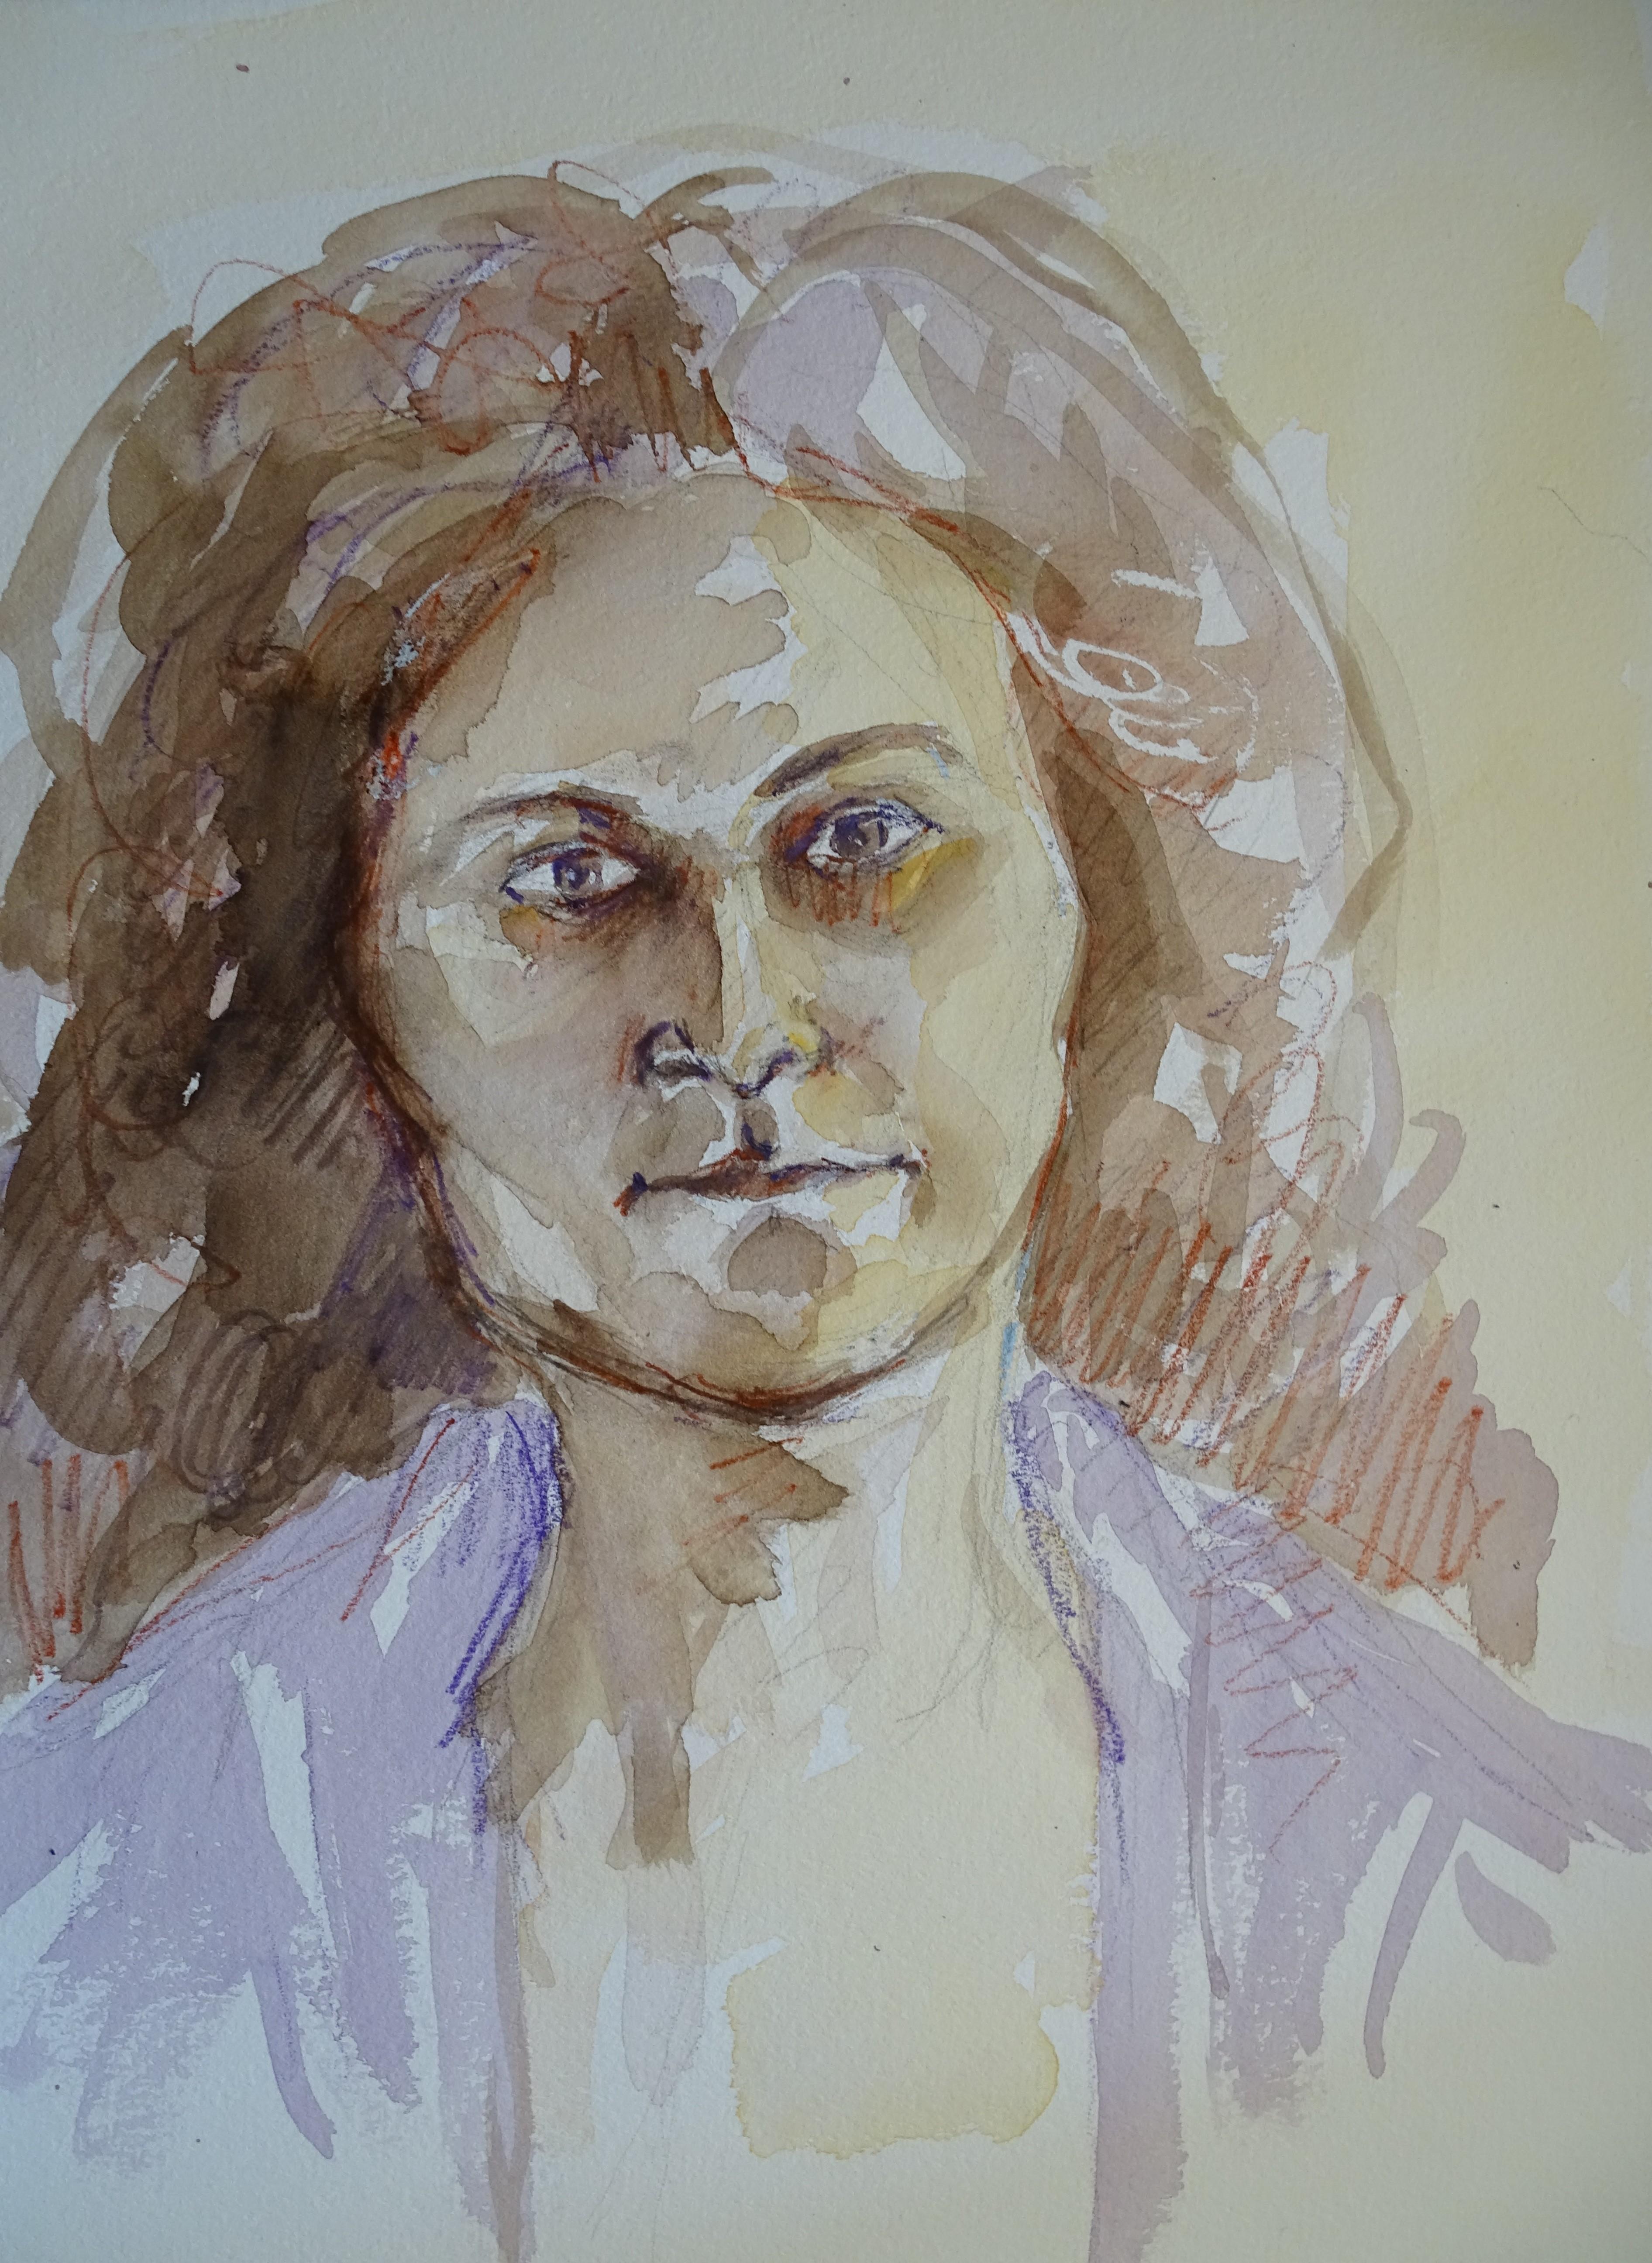 Portrait-Nadia-Aquarell-Zeichnung-Kunst-Bad-birnbach